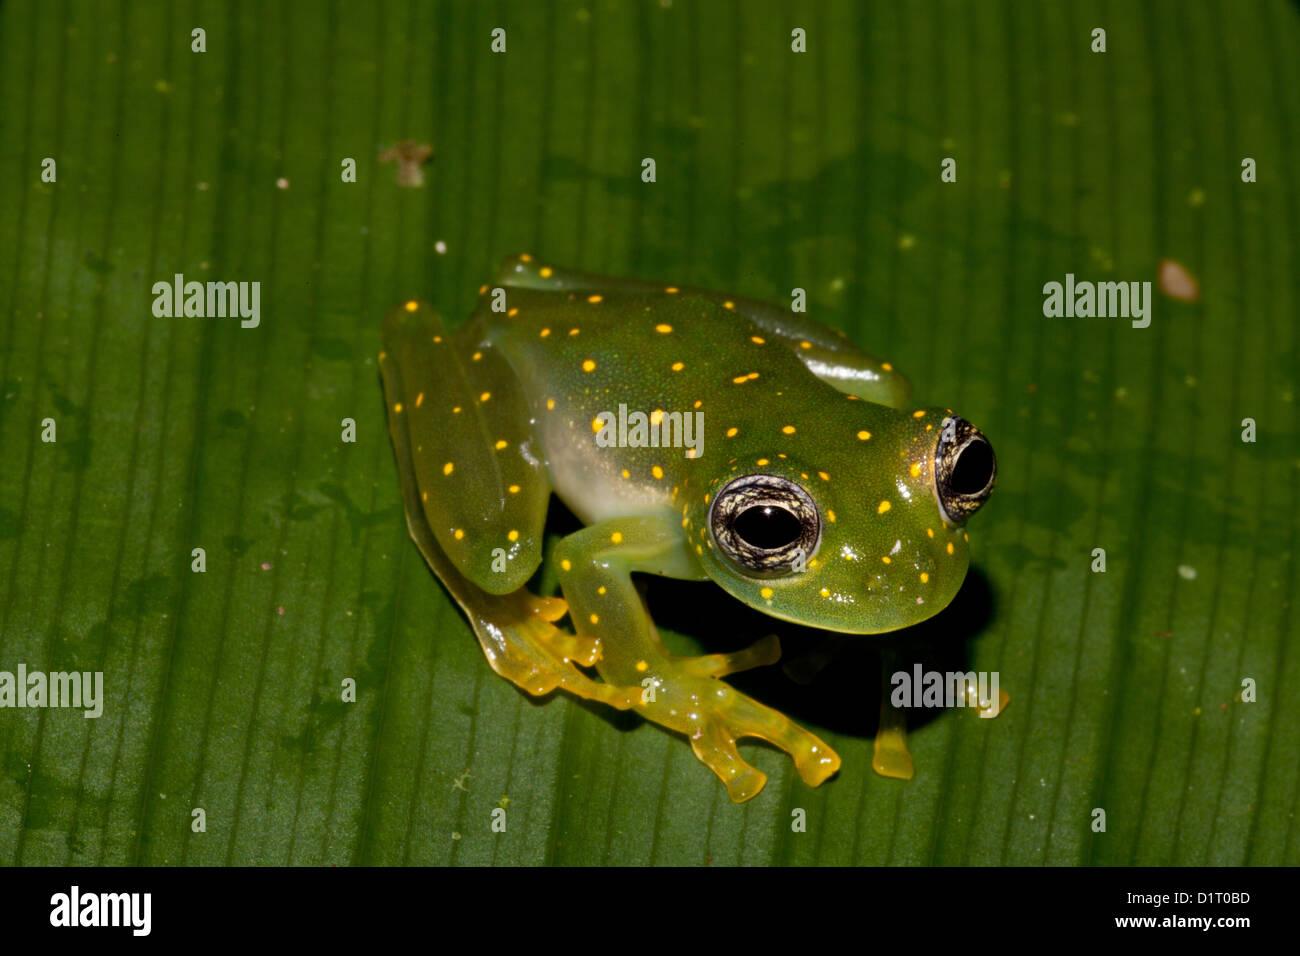 White-spotted cochran frog, (Yellow-flecked glass frog), sci.name; Cochranella albomaculata, at Burbayar, Panama. - Stock Image